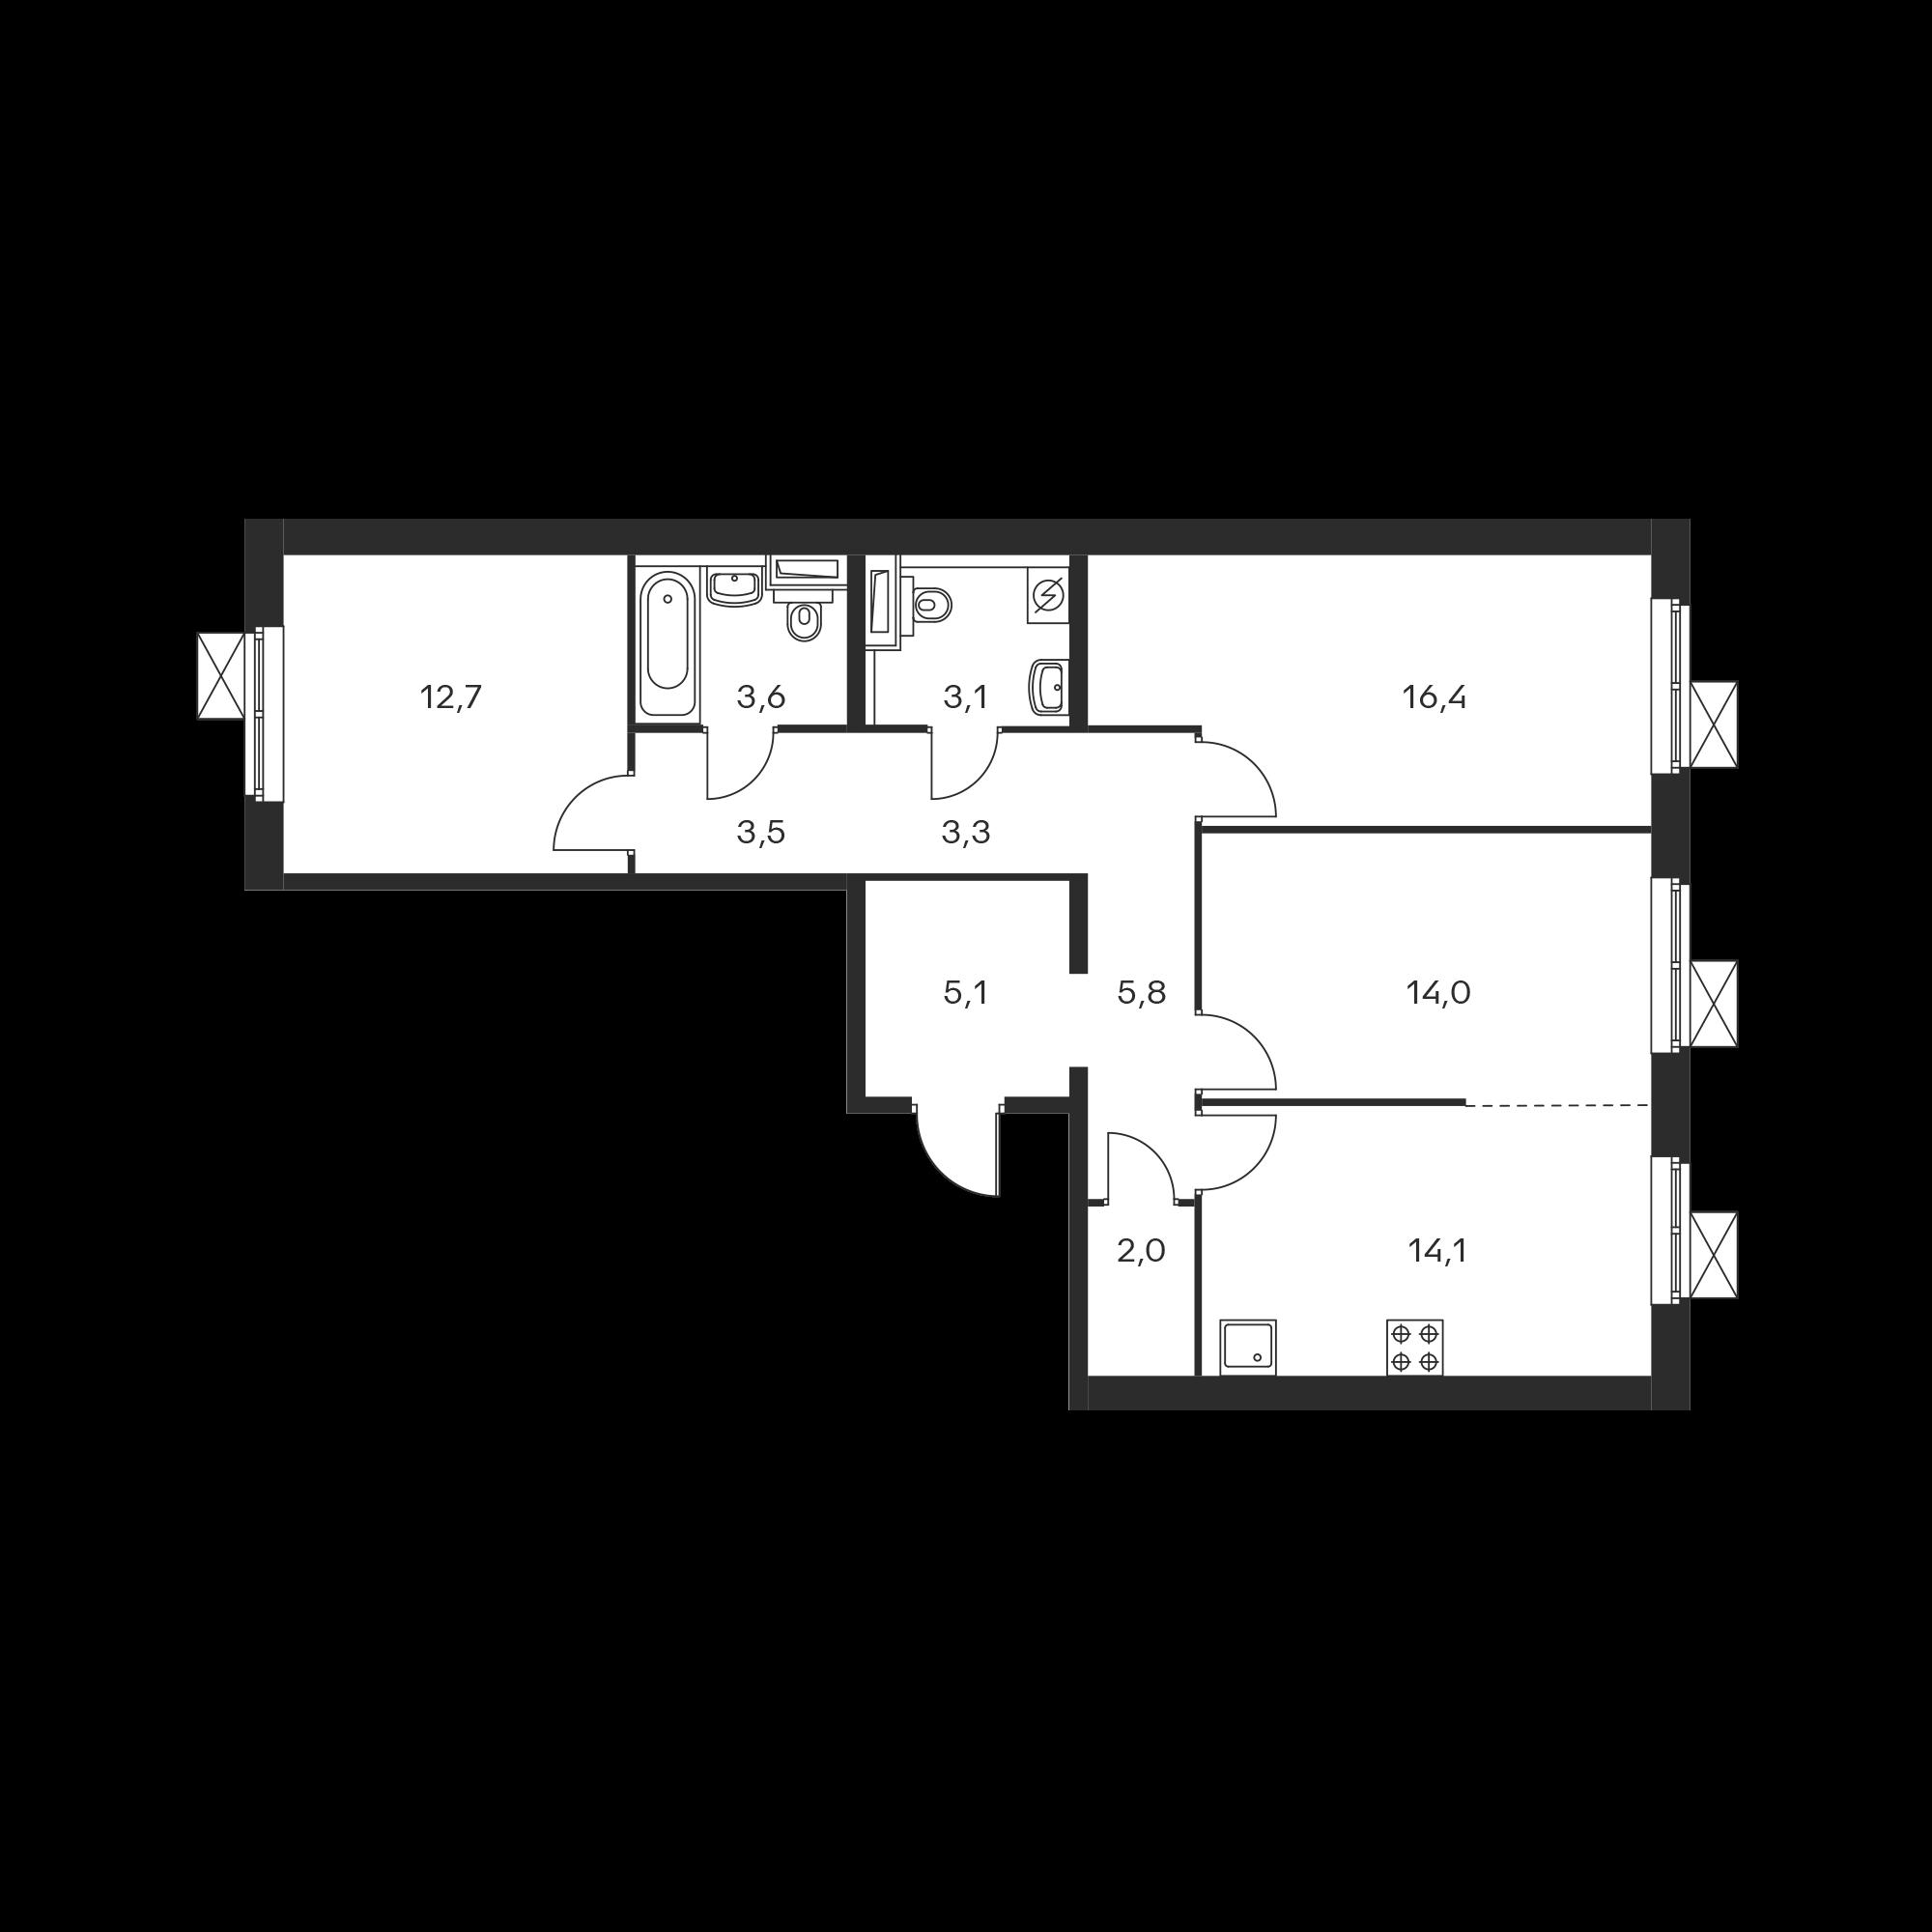 3KL13_9.0-1